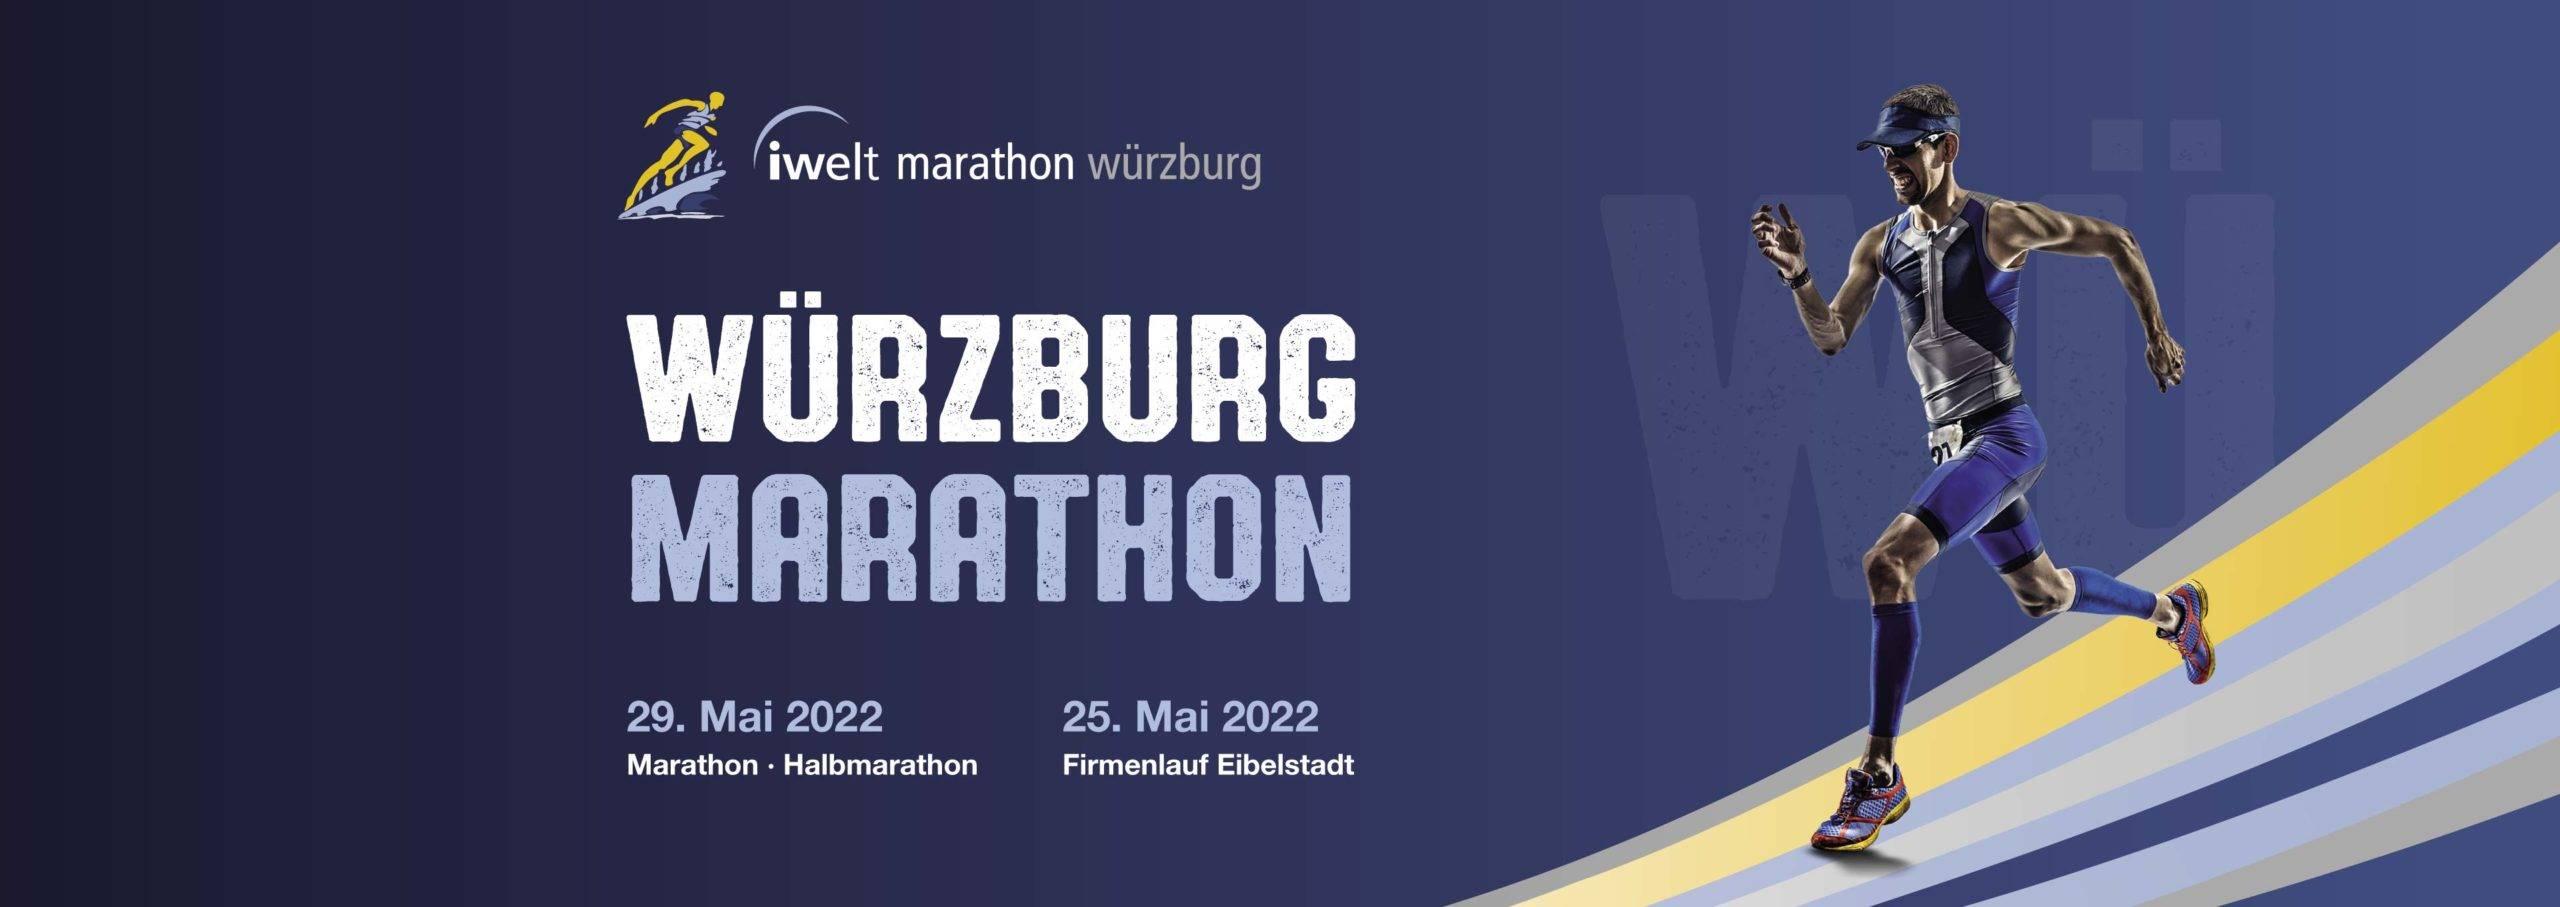 iWelt Marathon Würzburg